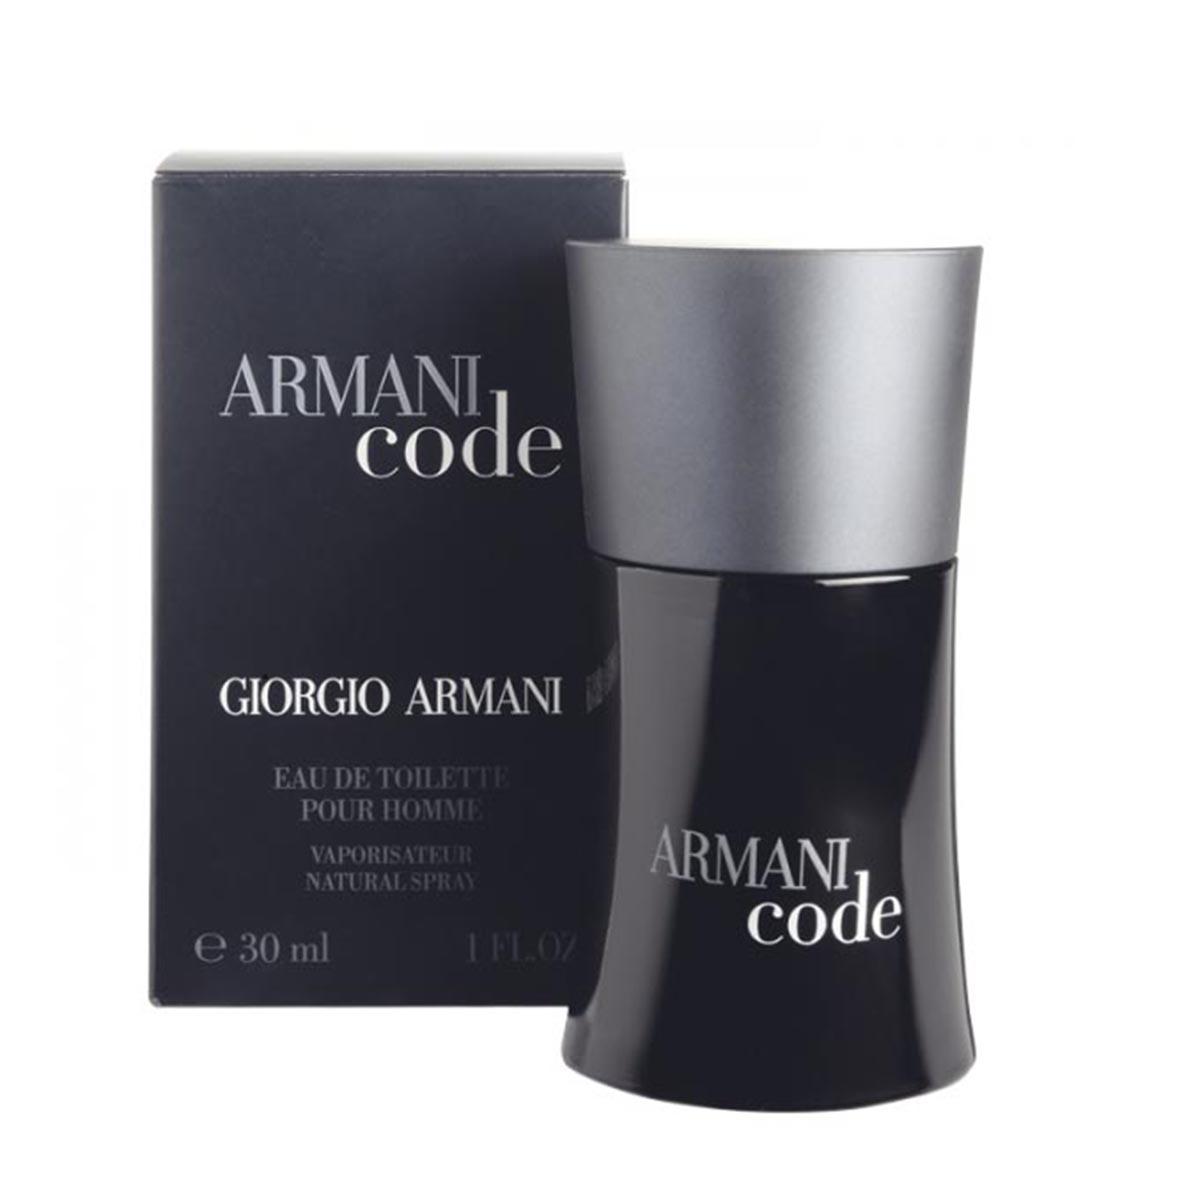 Giorgio armani black code men eau de toilette 30ml vaporizador